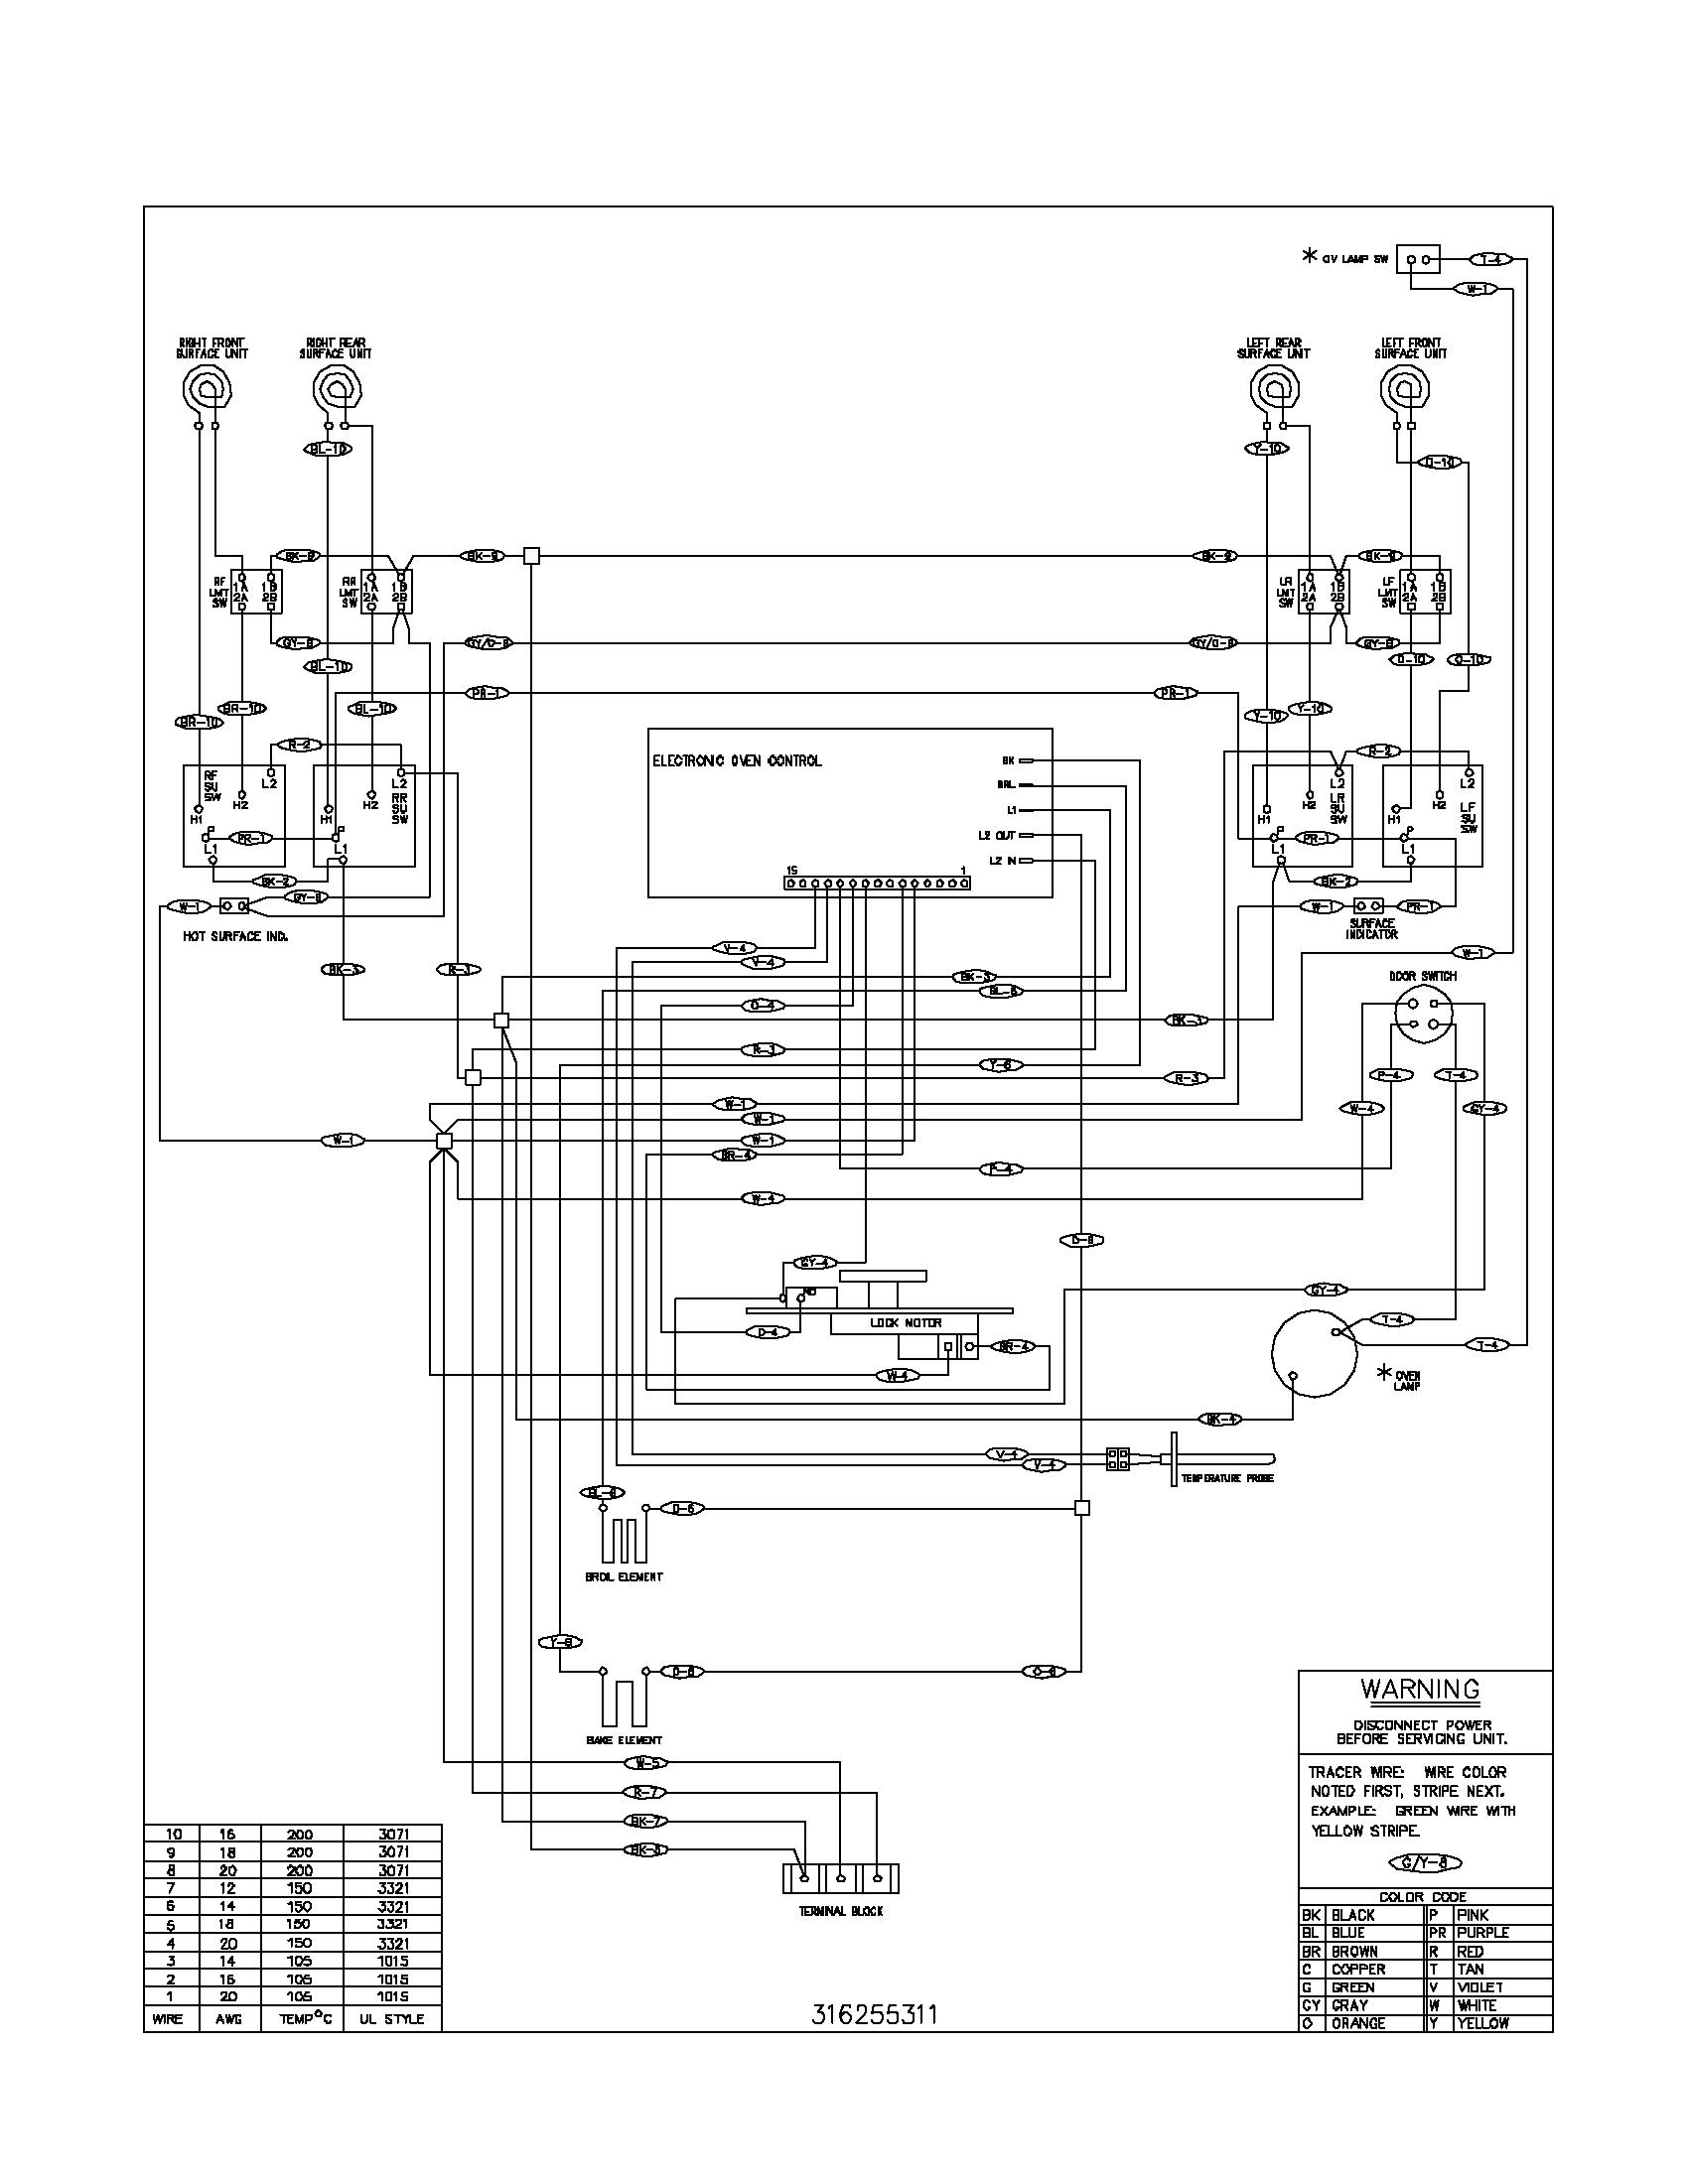 Charming Bobcat 773 Wiring Diagram bar graphs images